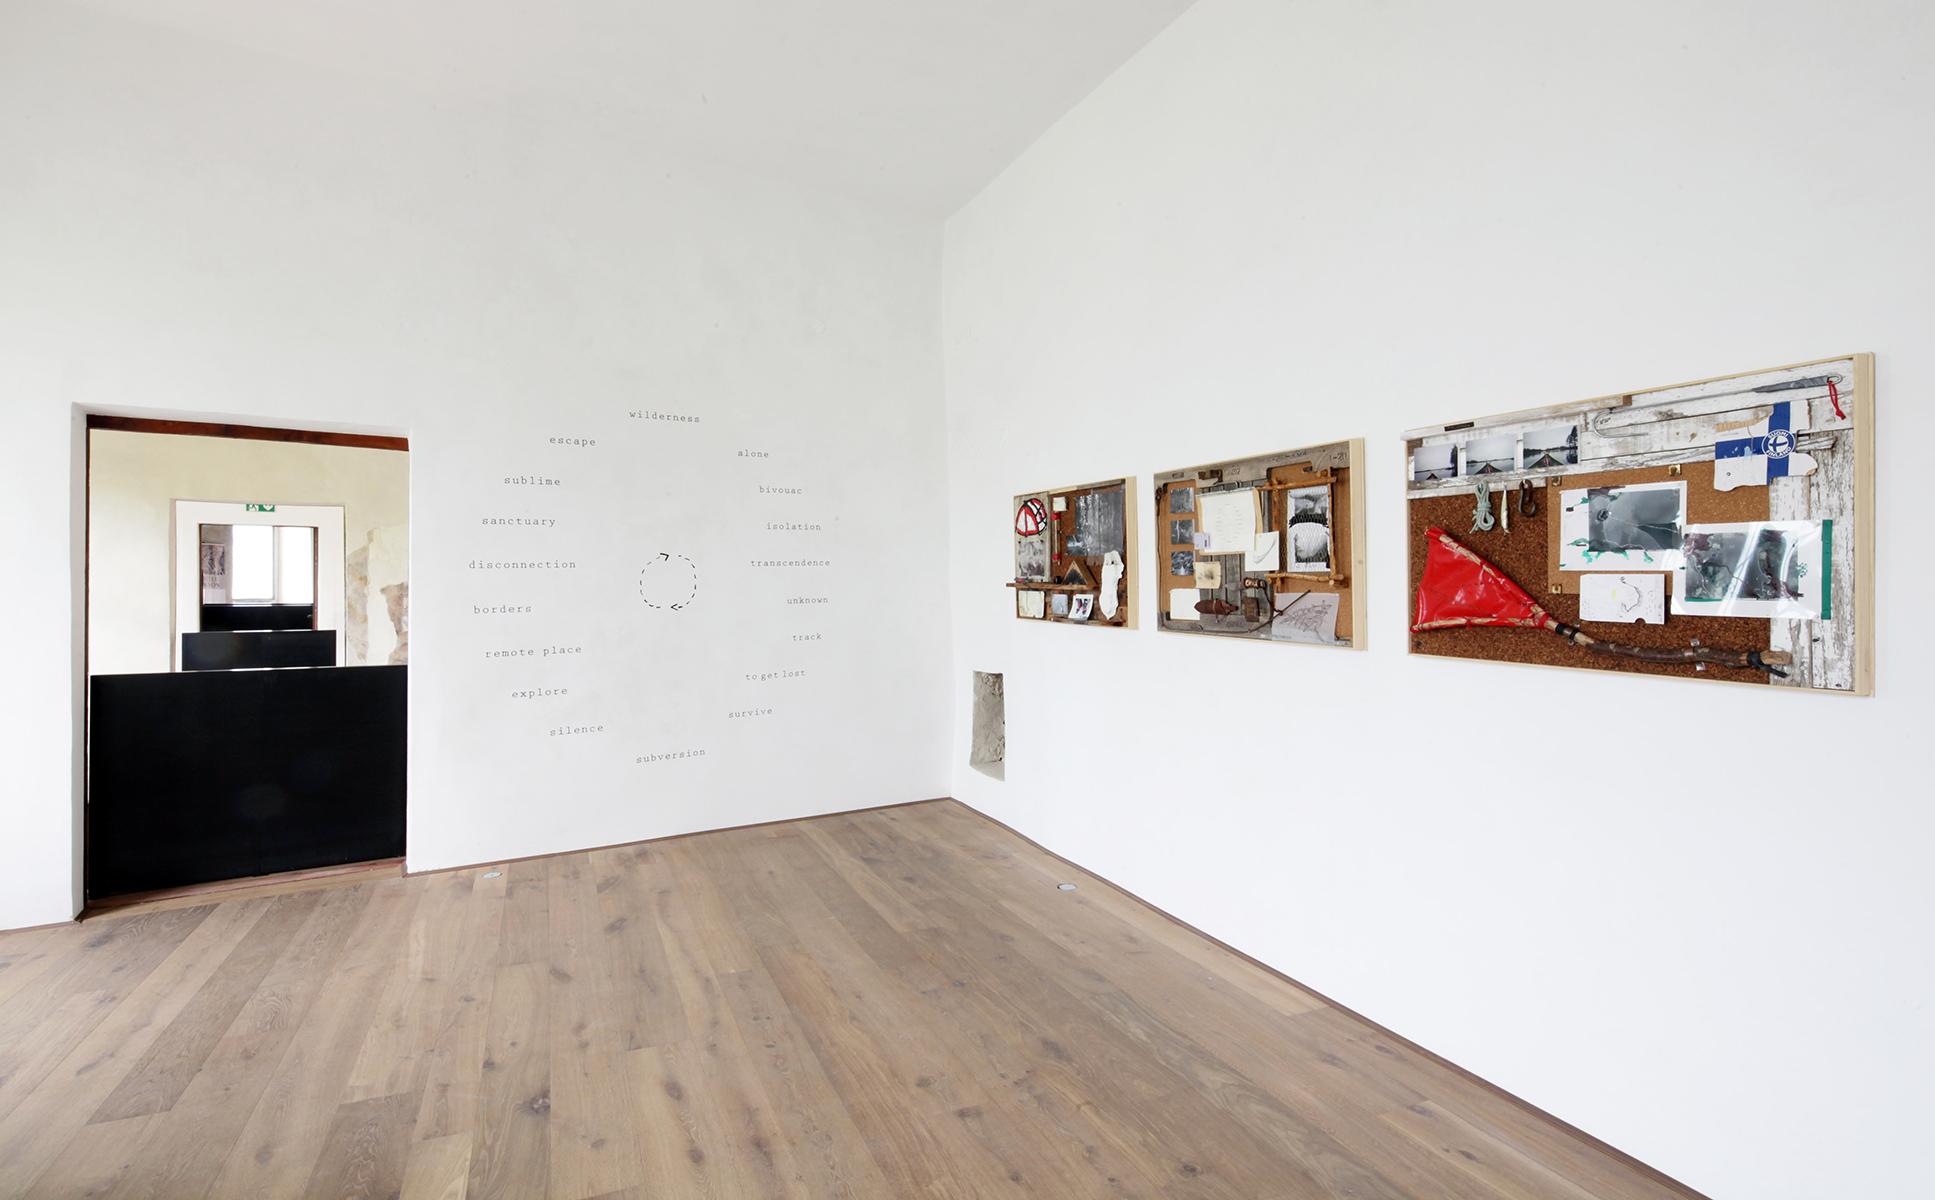 Daniele Girardi, 2021, Installazione, opera arte, artista, mostra pubblica, museo arte